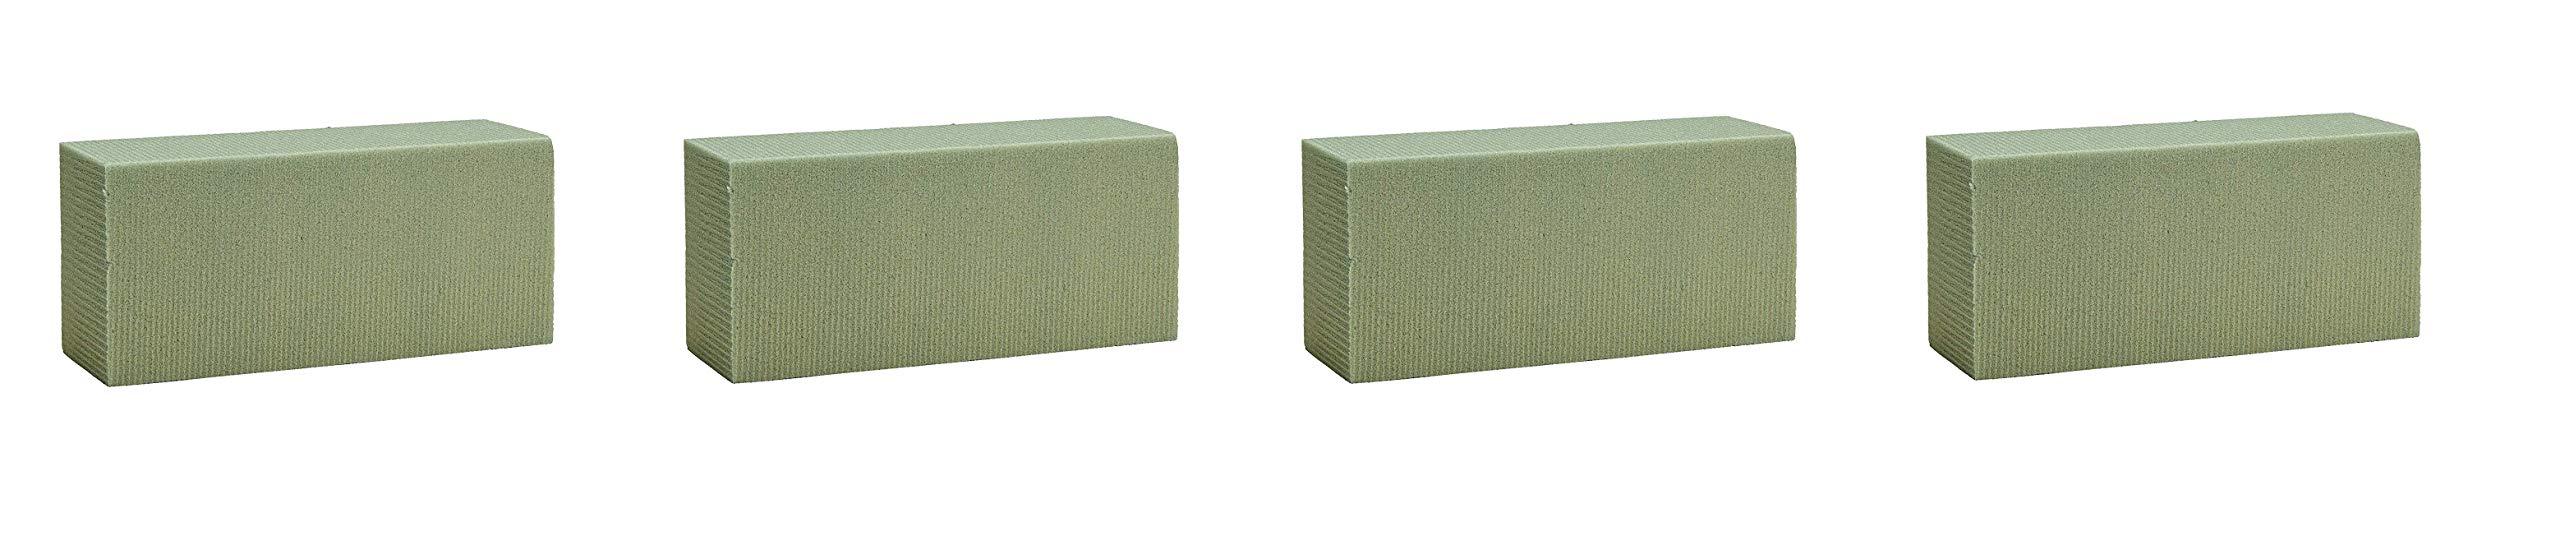 FloraCraft Floral Dry Foam 6 Piece Brick 2.6 Inch x 3.5 Inch x 7.8 Inch Green (Fоur Paсk)